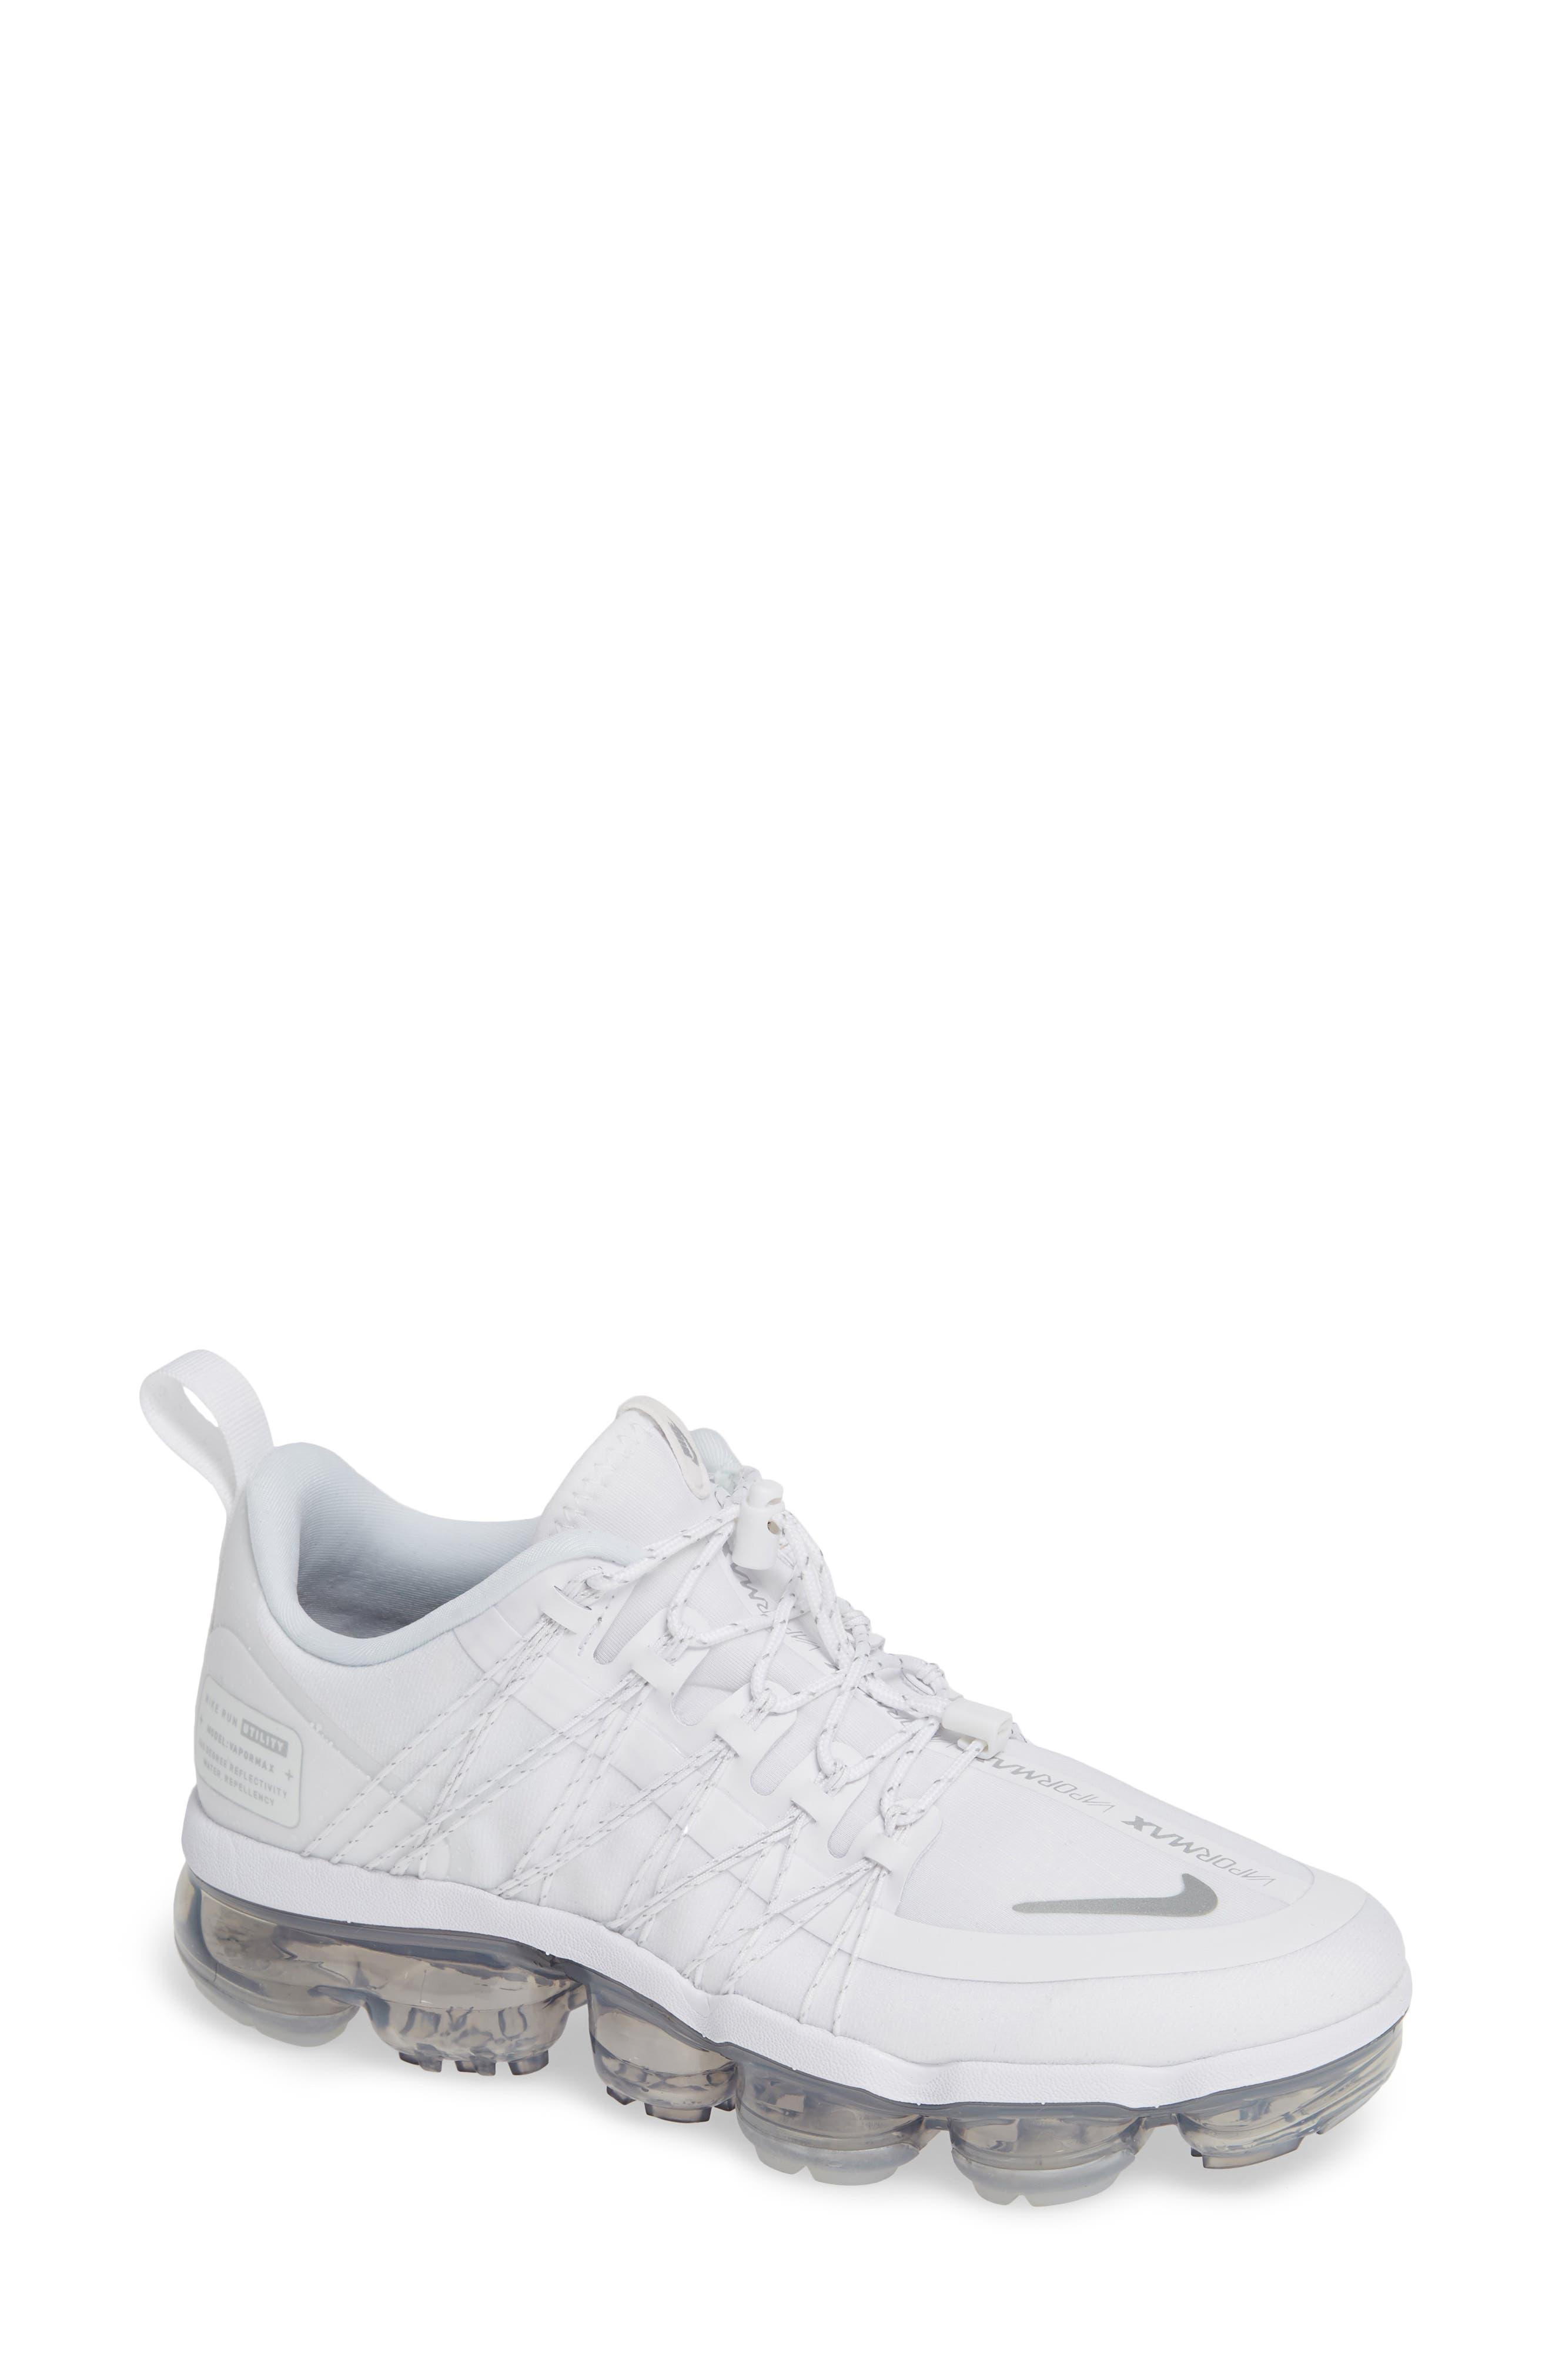 NIKE, Air VaporMax Run Utility Sneaker, Main thumbnail 1, color, WHITE/ REFLECT SILVER/ WHITE